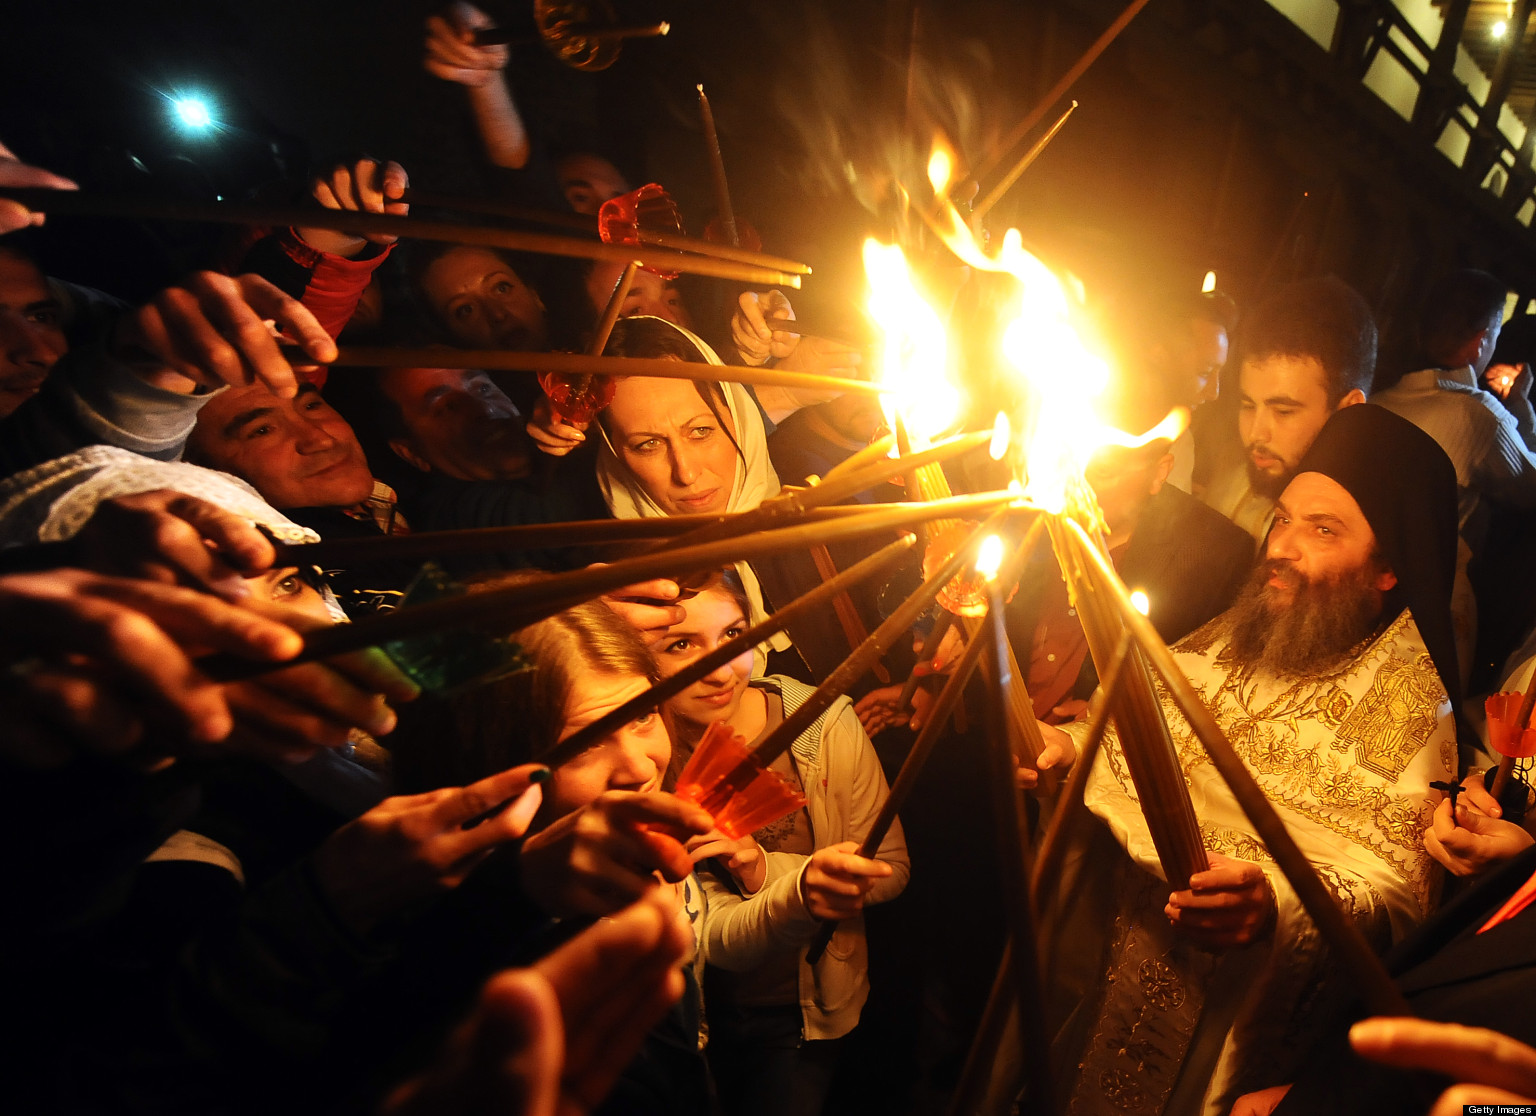 http://i.huffpost.com/gen/1121009/images/o-HOLY-FIRE-JERUSALEM-facebook.jpg